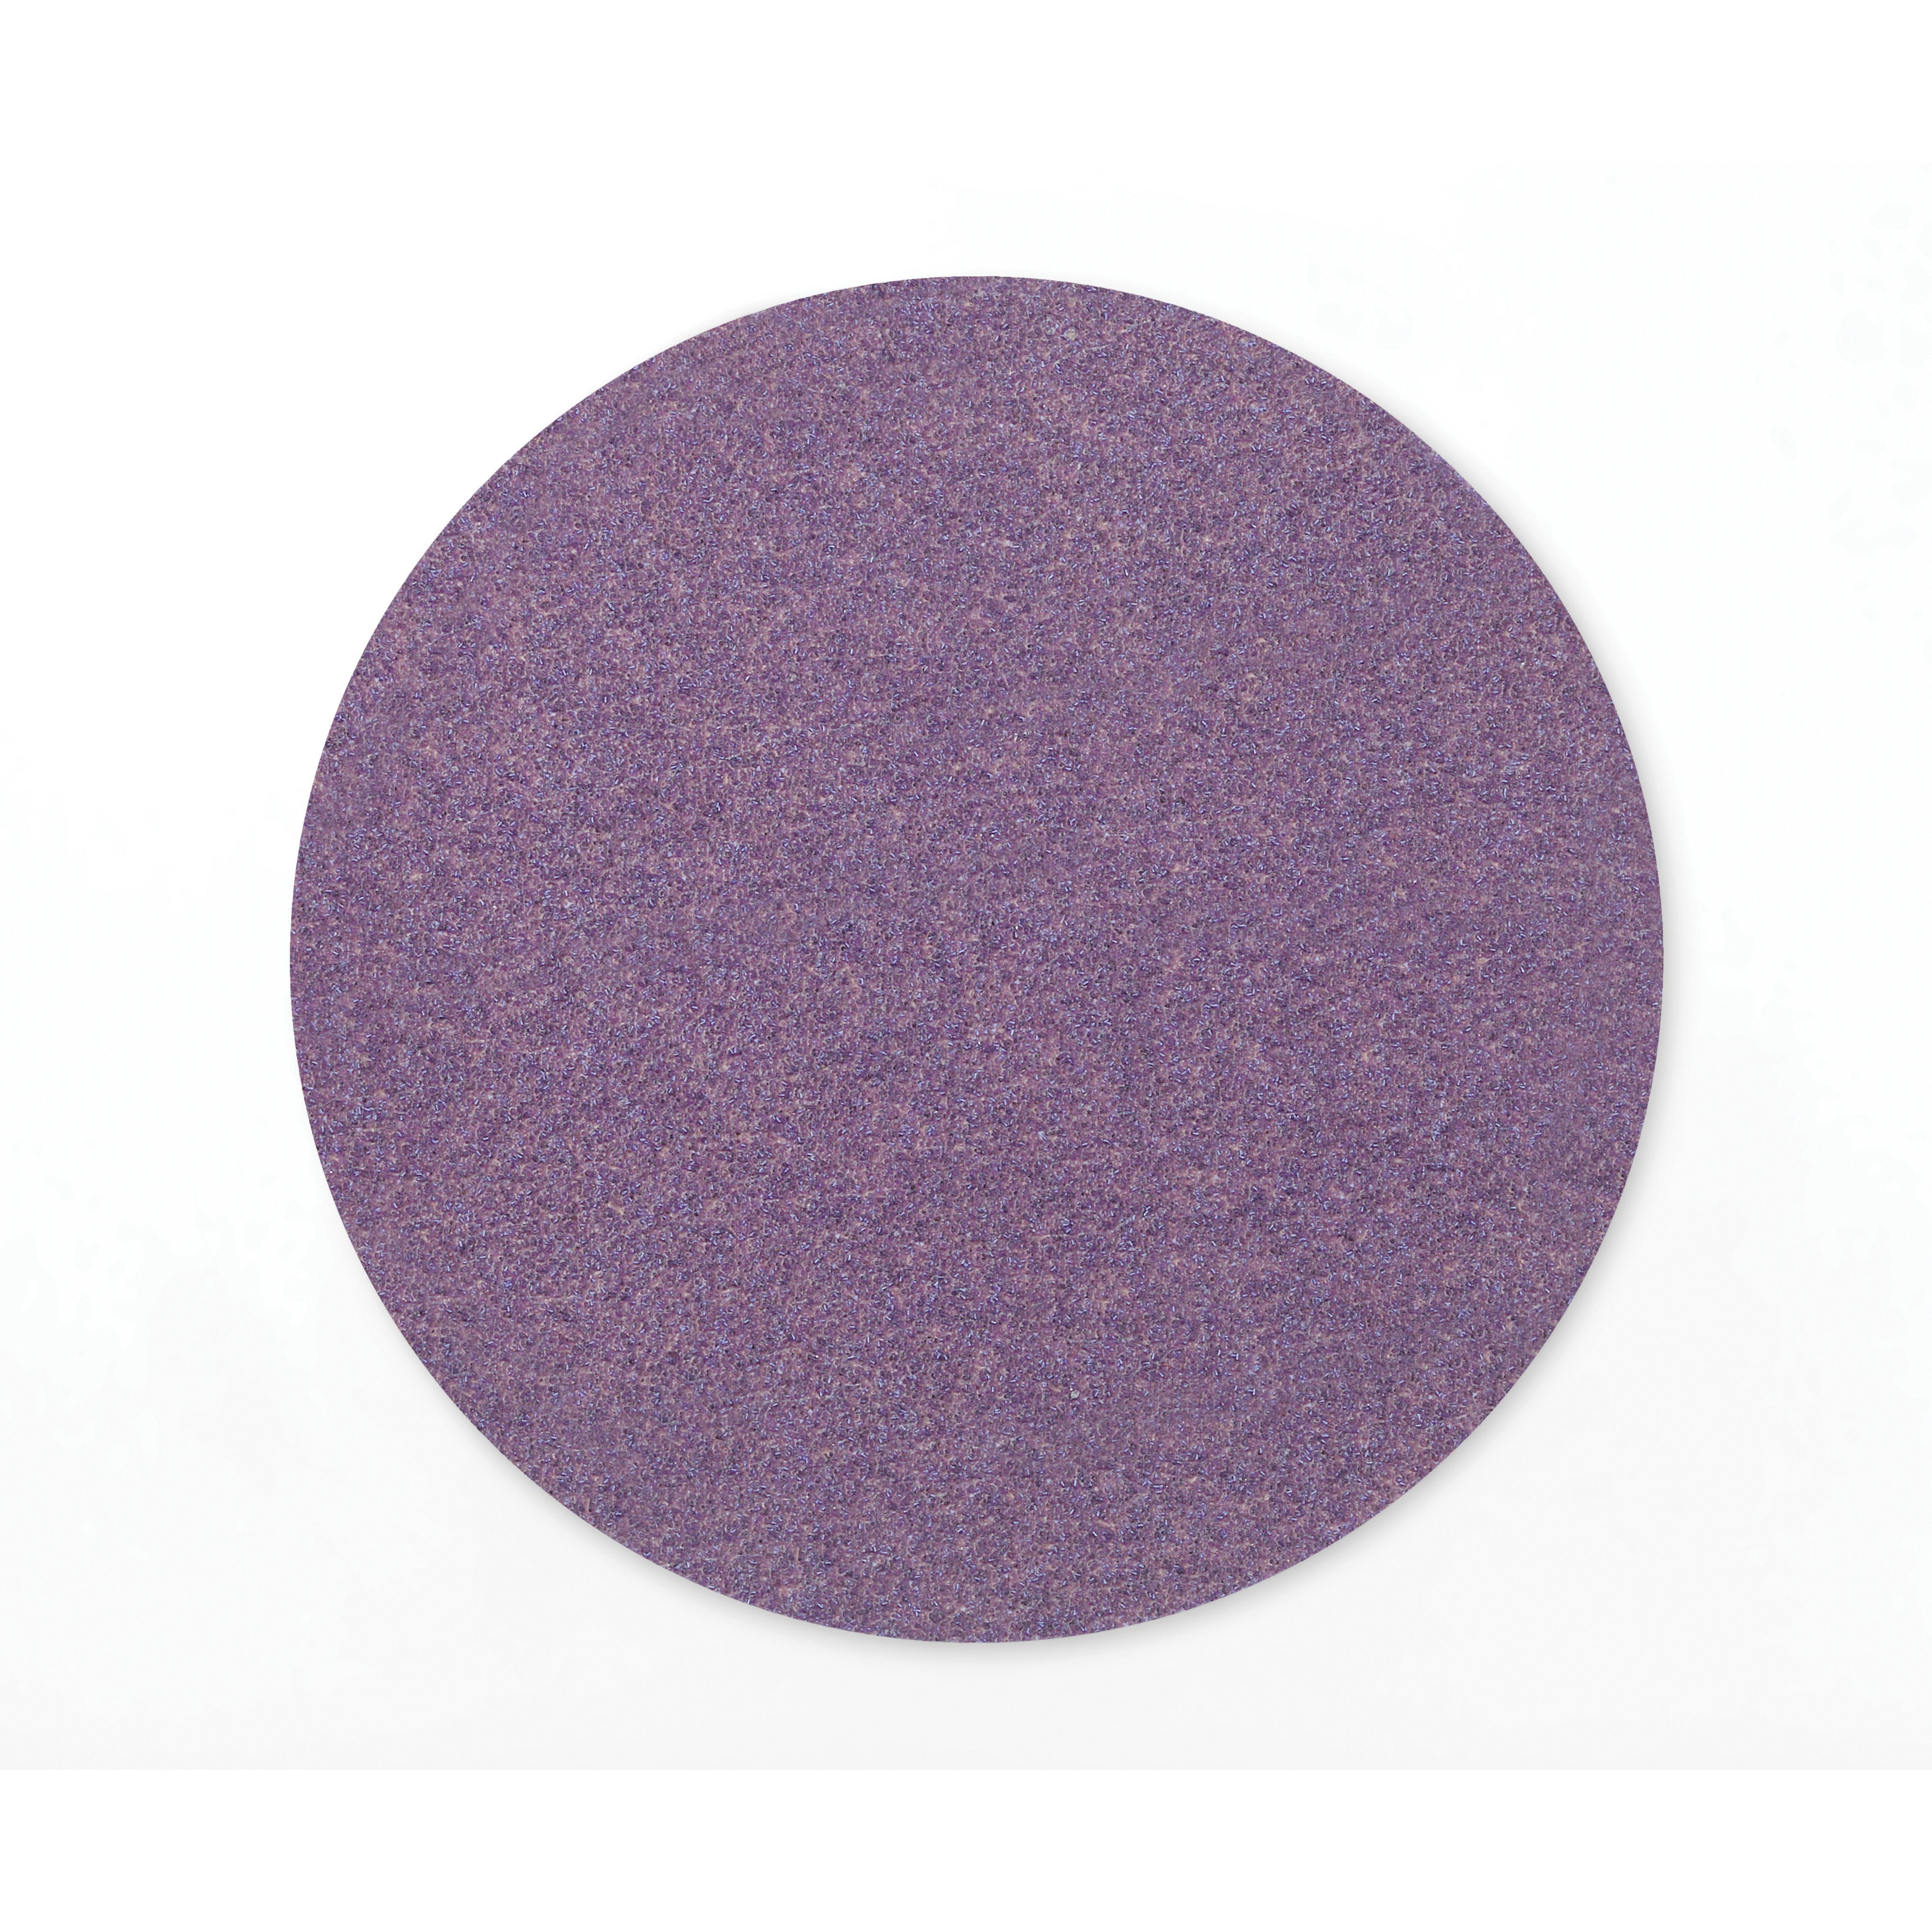 Cubitron™ II 051119-65253 Narrow Coated Abrasive Belt, 1 in W x 72 in L, 60 Grit, Ceramic Abrasive, Polyester Backing